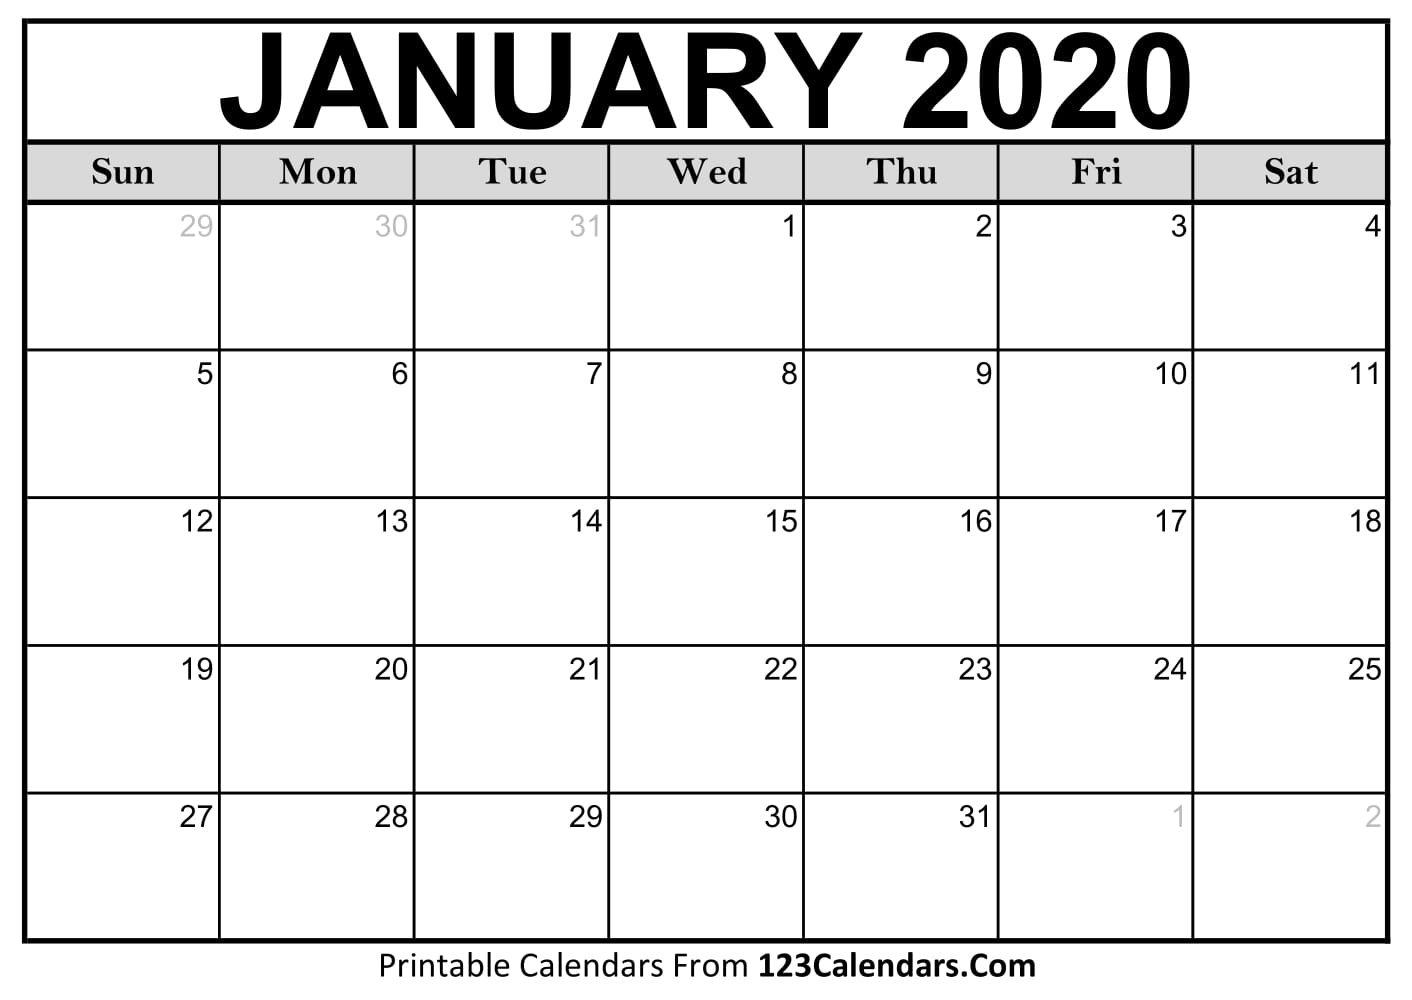 January 2020 Printable Calendar | 123Calendars Calendar 2019 January Printable